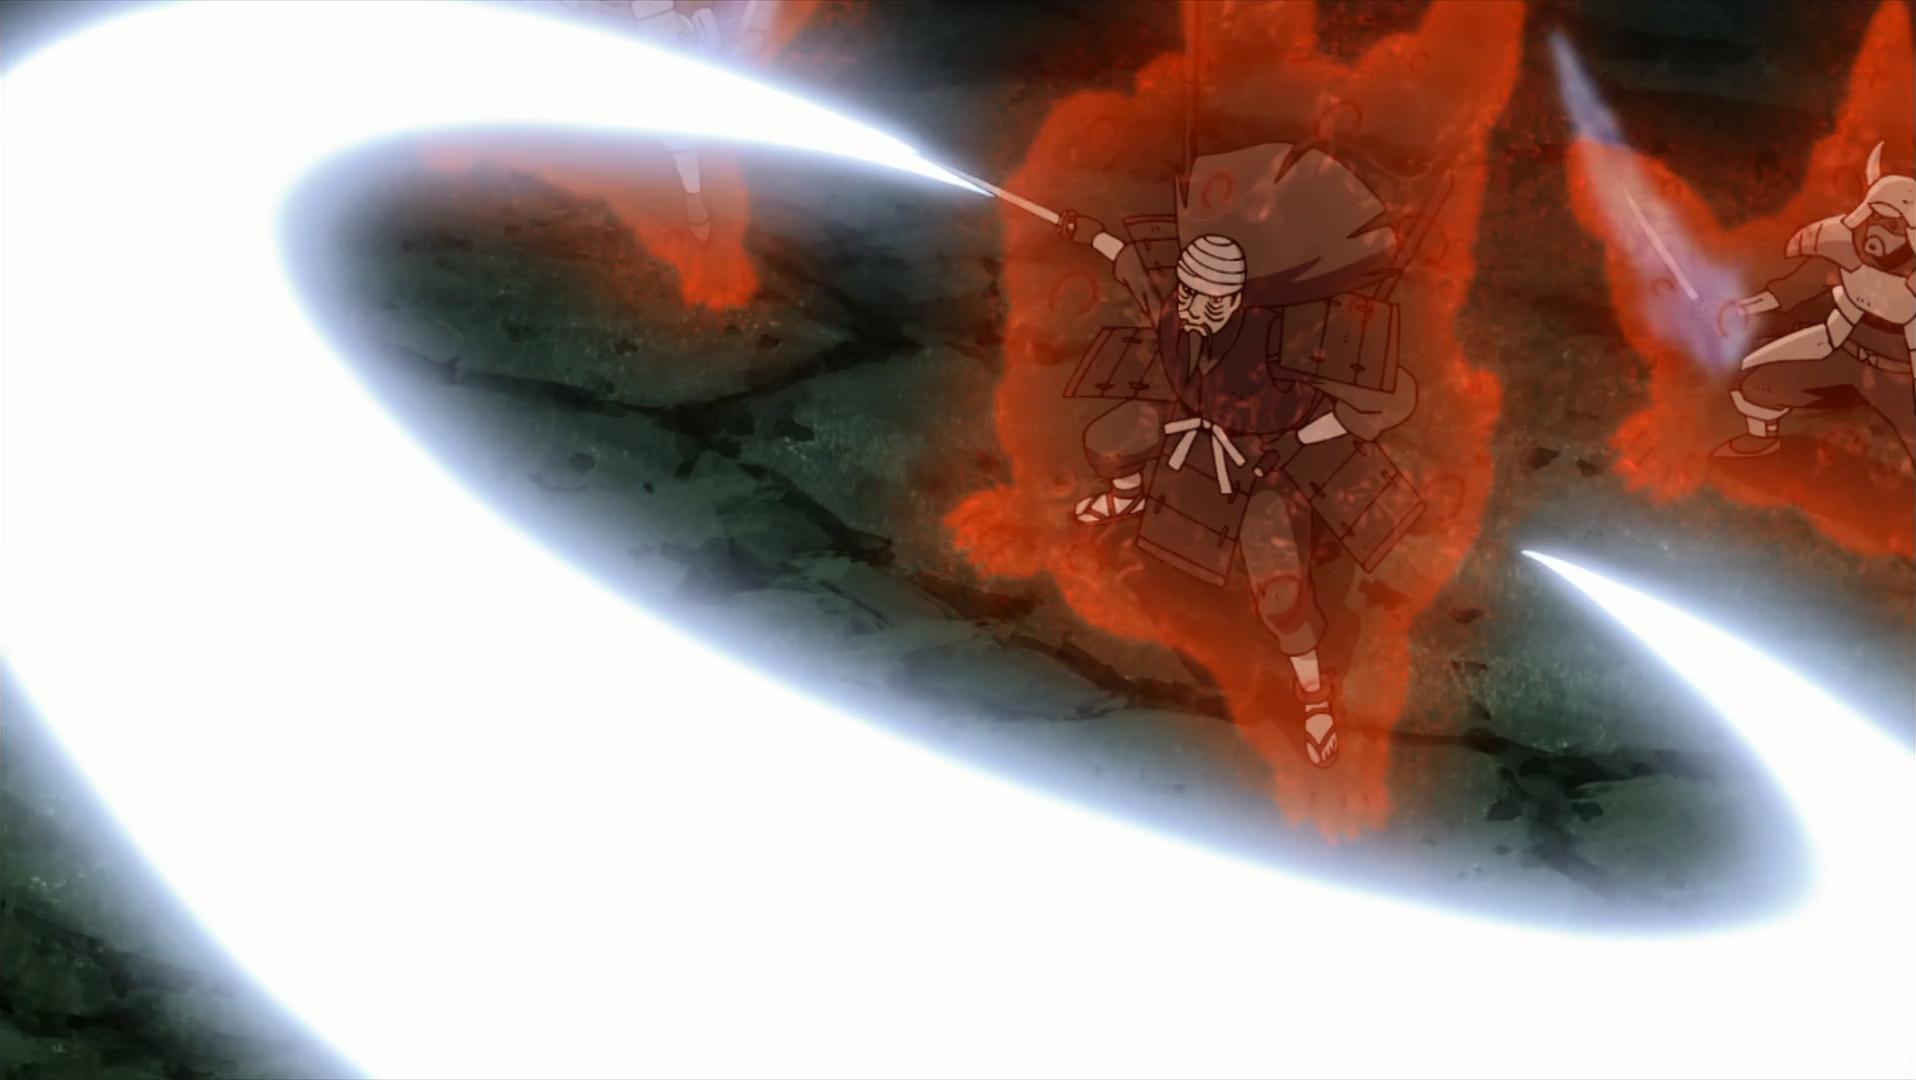 Sakura vs kinshiki - Página 10 Latest?cb=20140612192223&path-prefix=pt-br